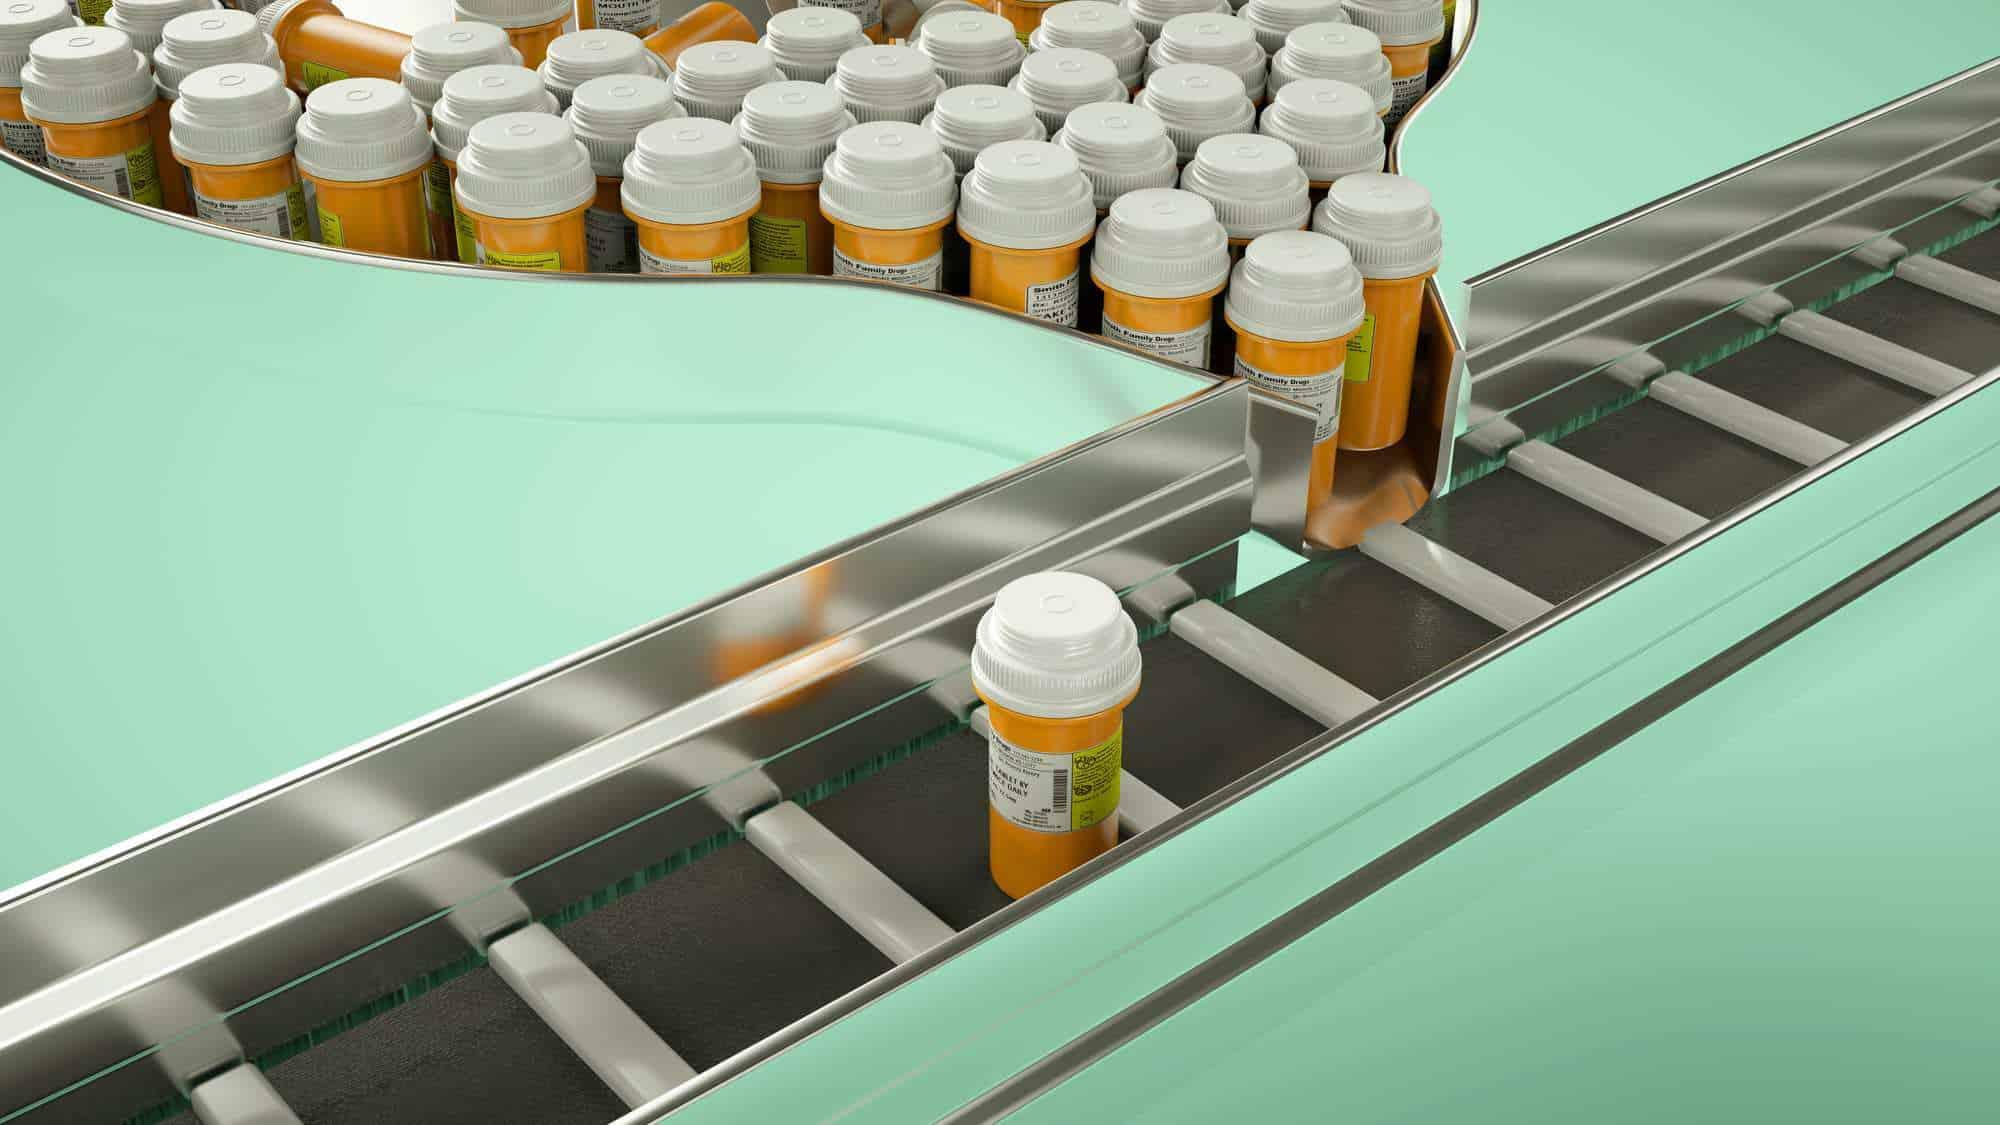 Do We Take Too Many Antidepressants?